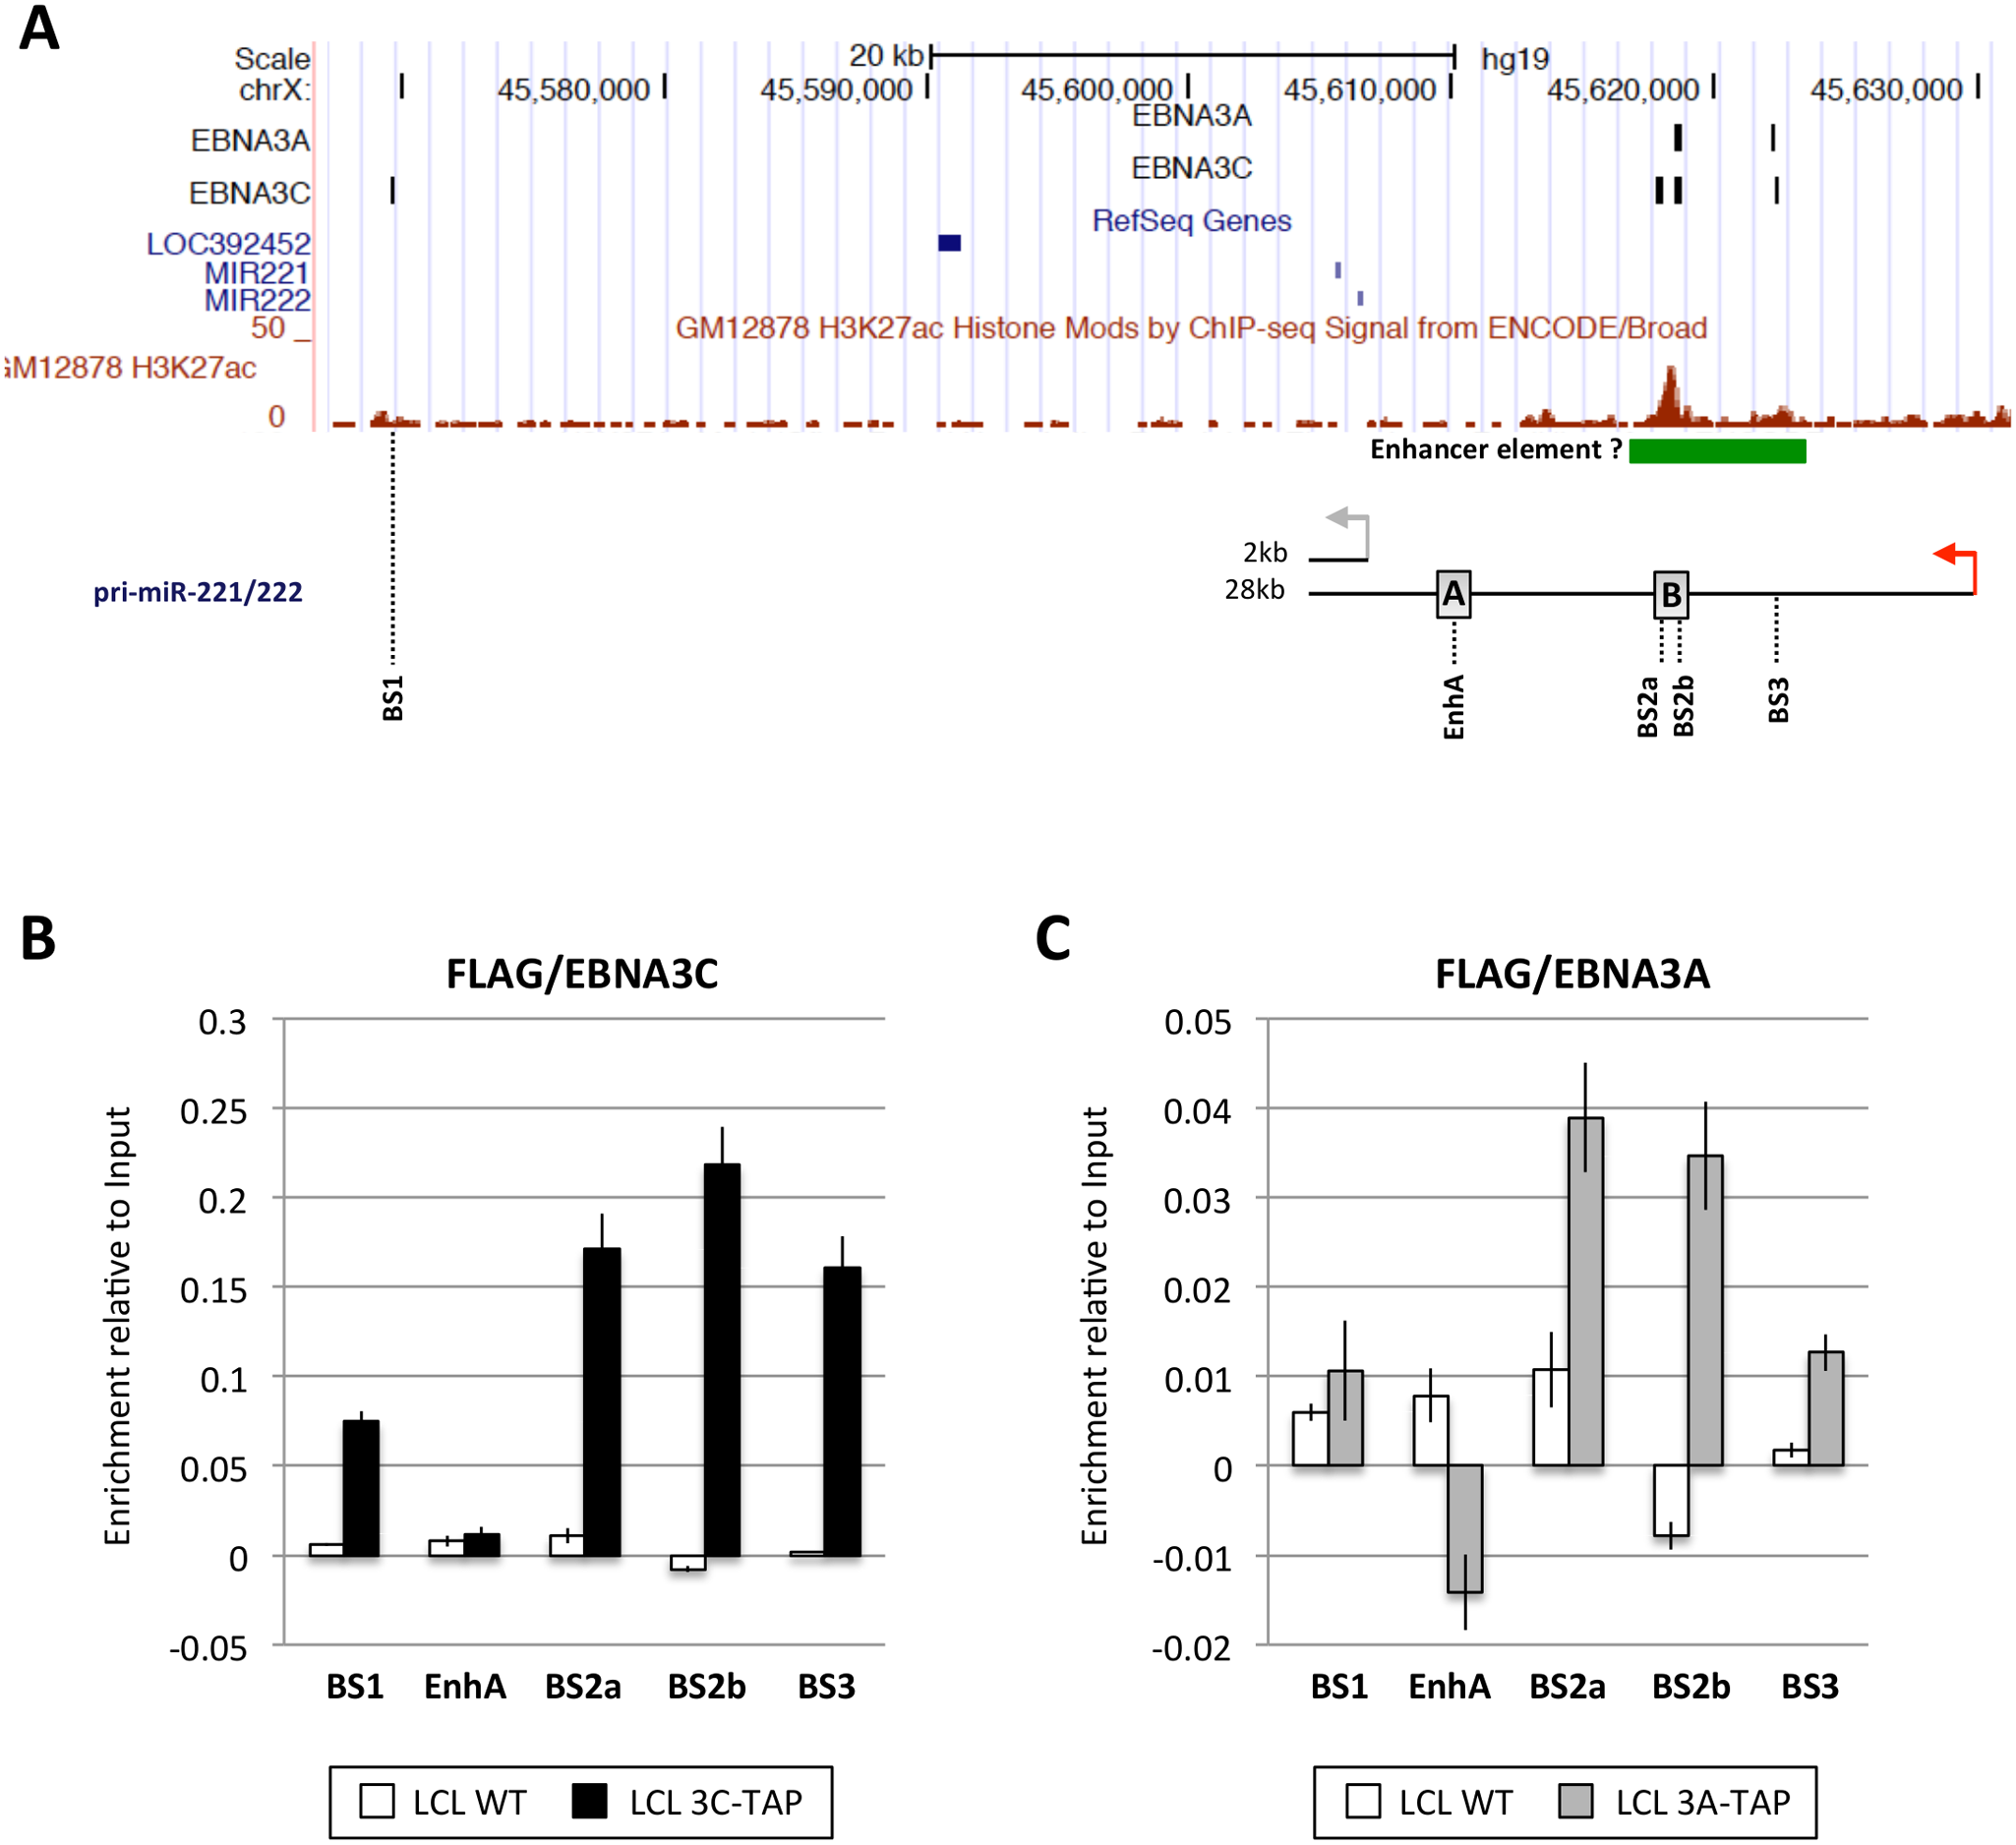 EBNA3A and EBNA3C bind near the miR-221/miR-222 locus.